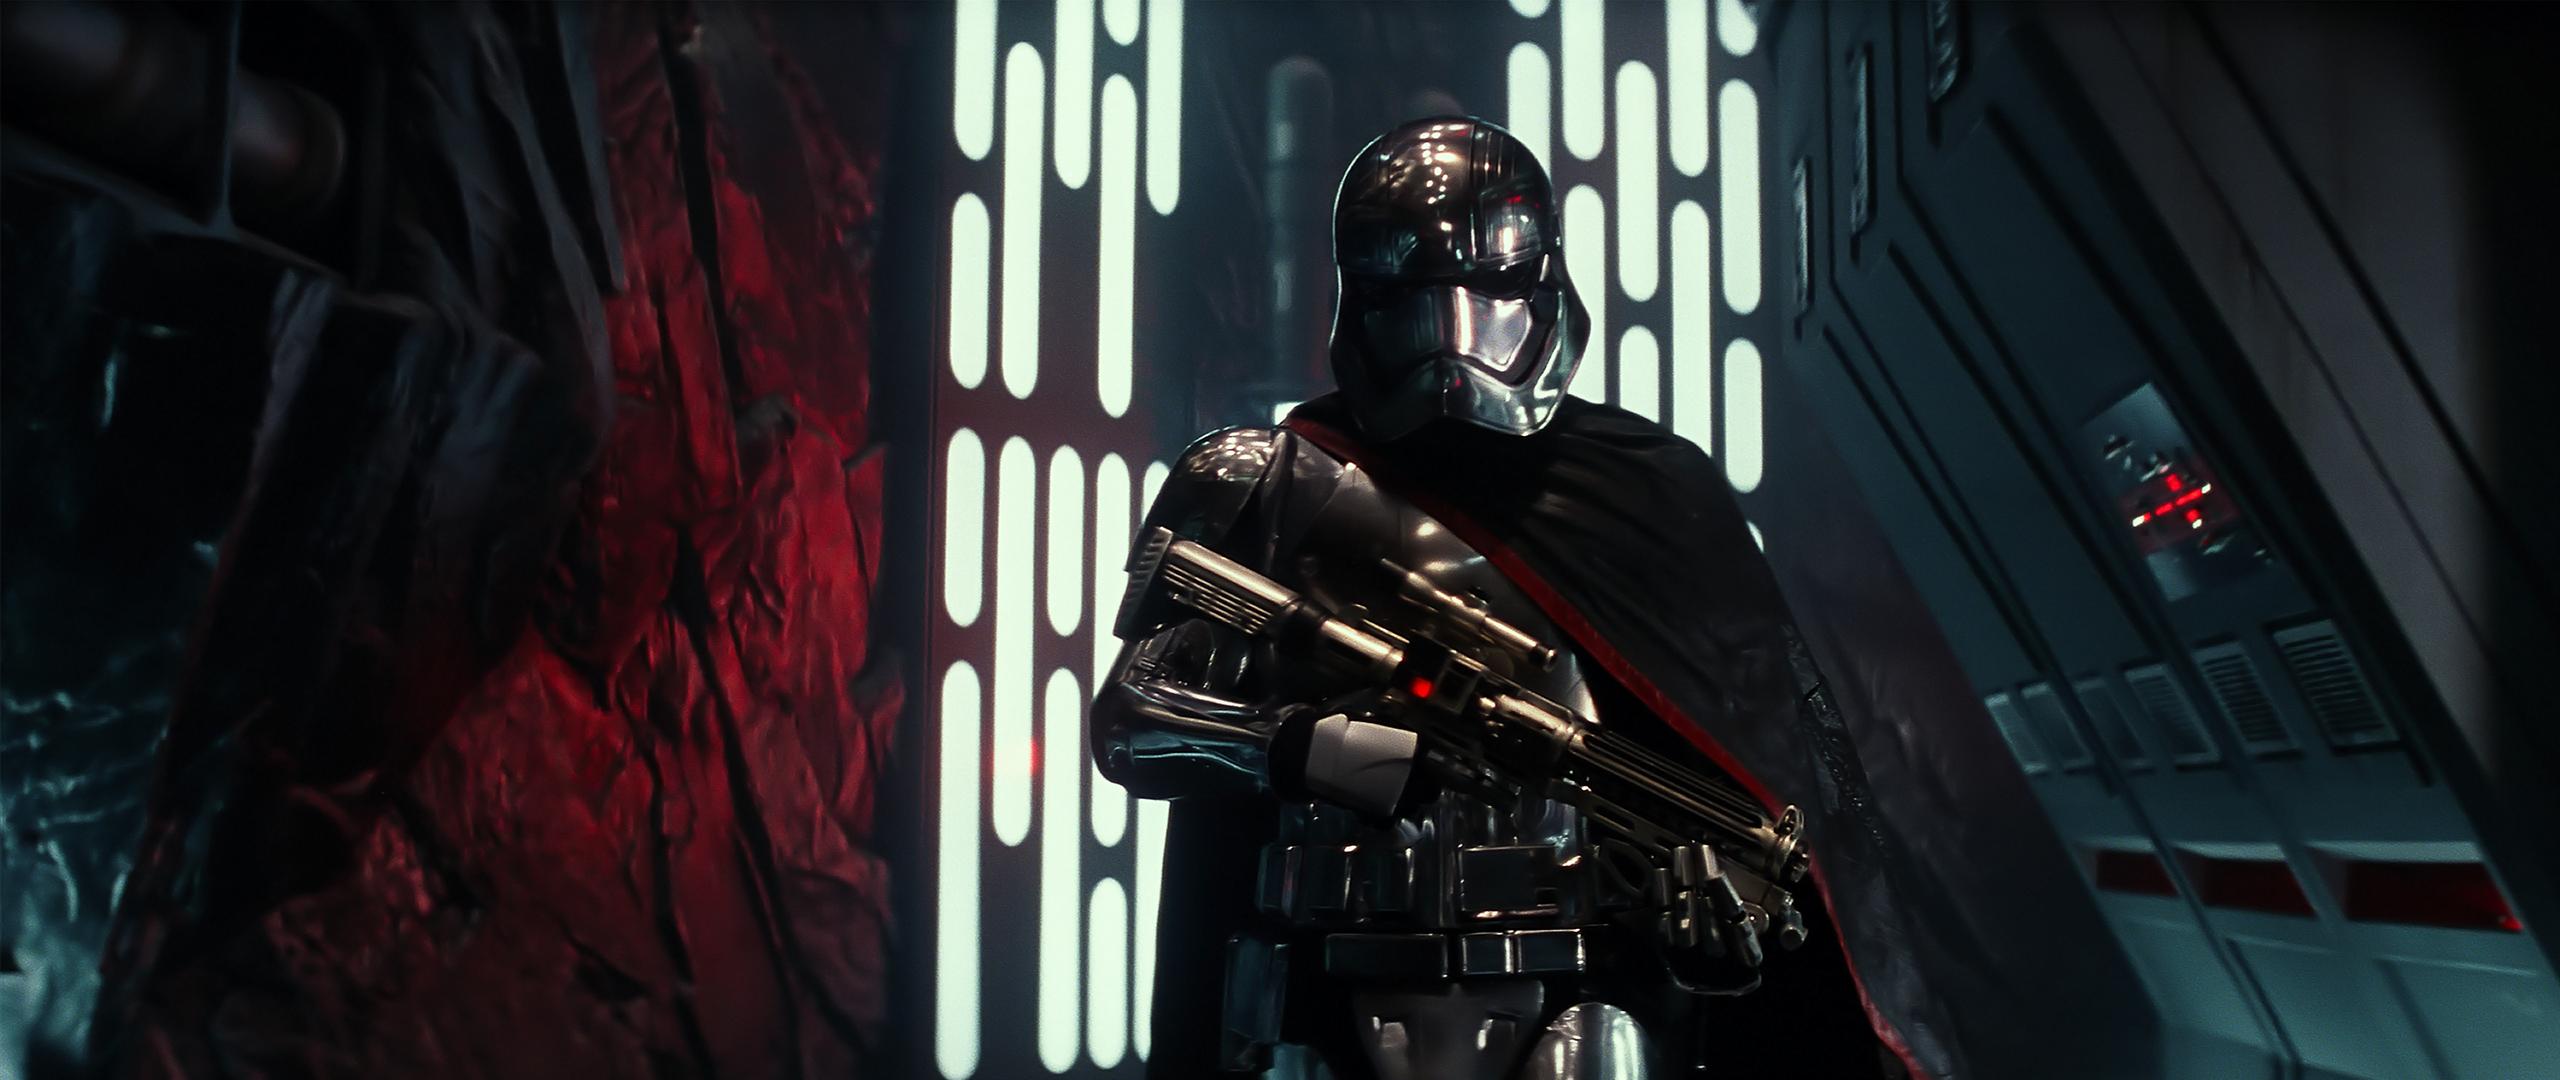 General 2560x1080 The New Order (Star Wars) movies blaster Star Wars Villains